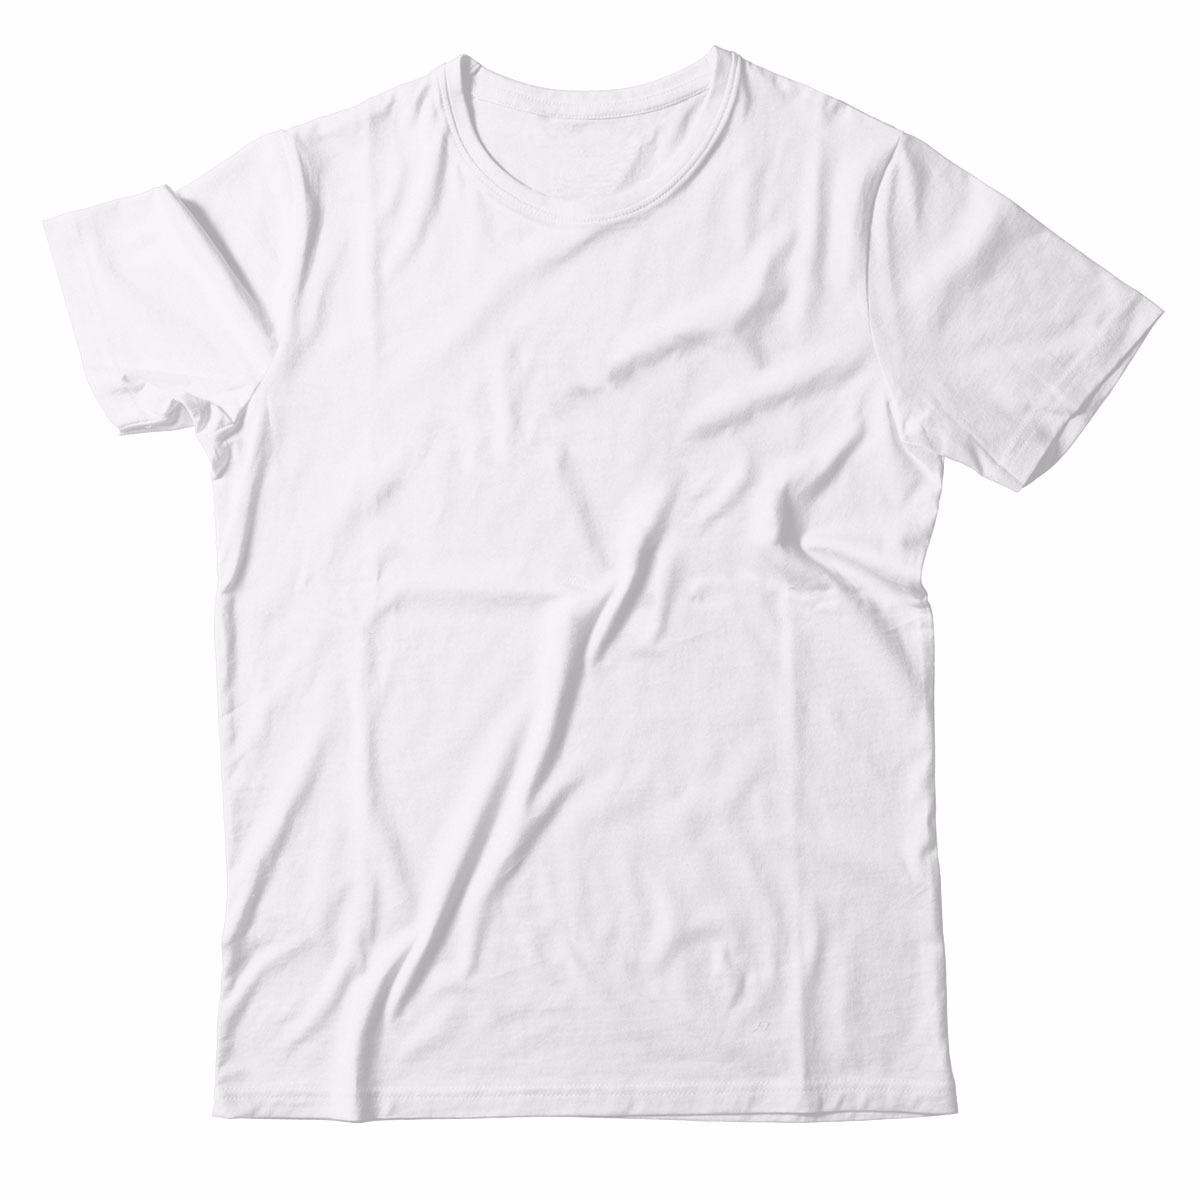 22887d0504 kit c/10 camiseta branca lisa básica atacado malha penteada. Carregando  zoom.